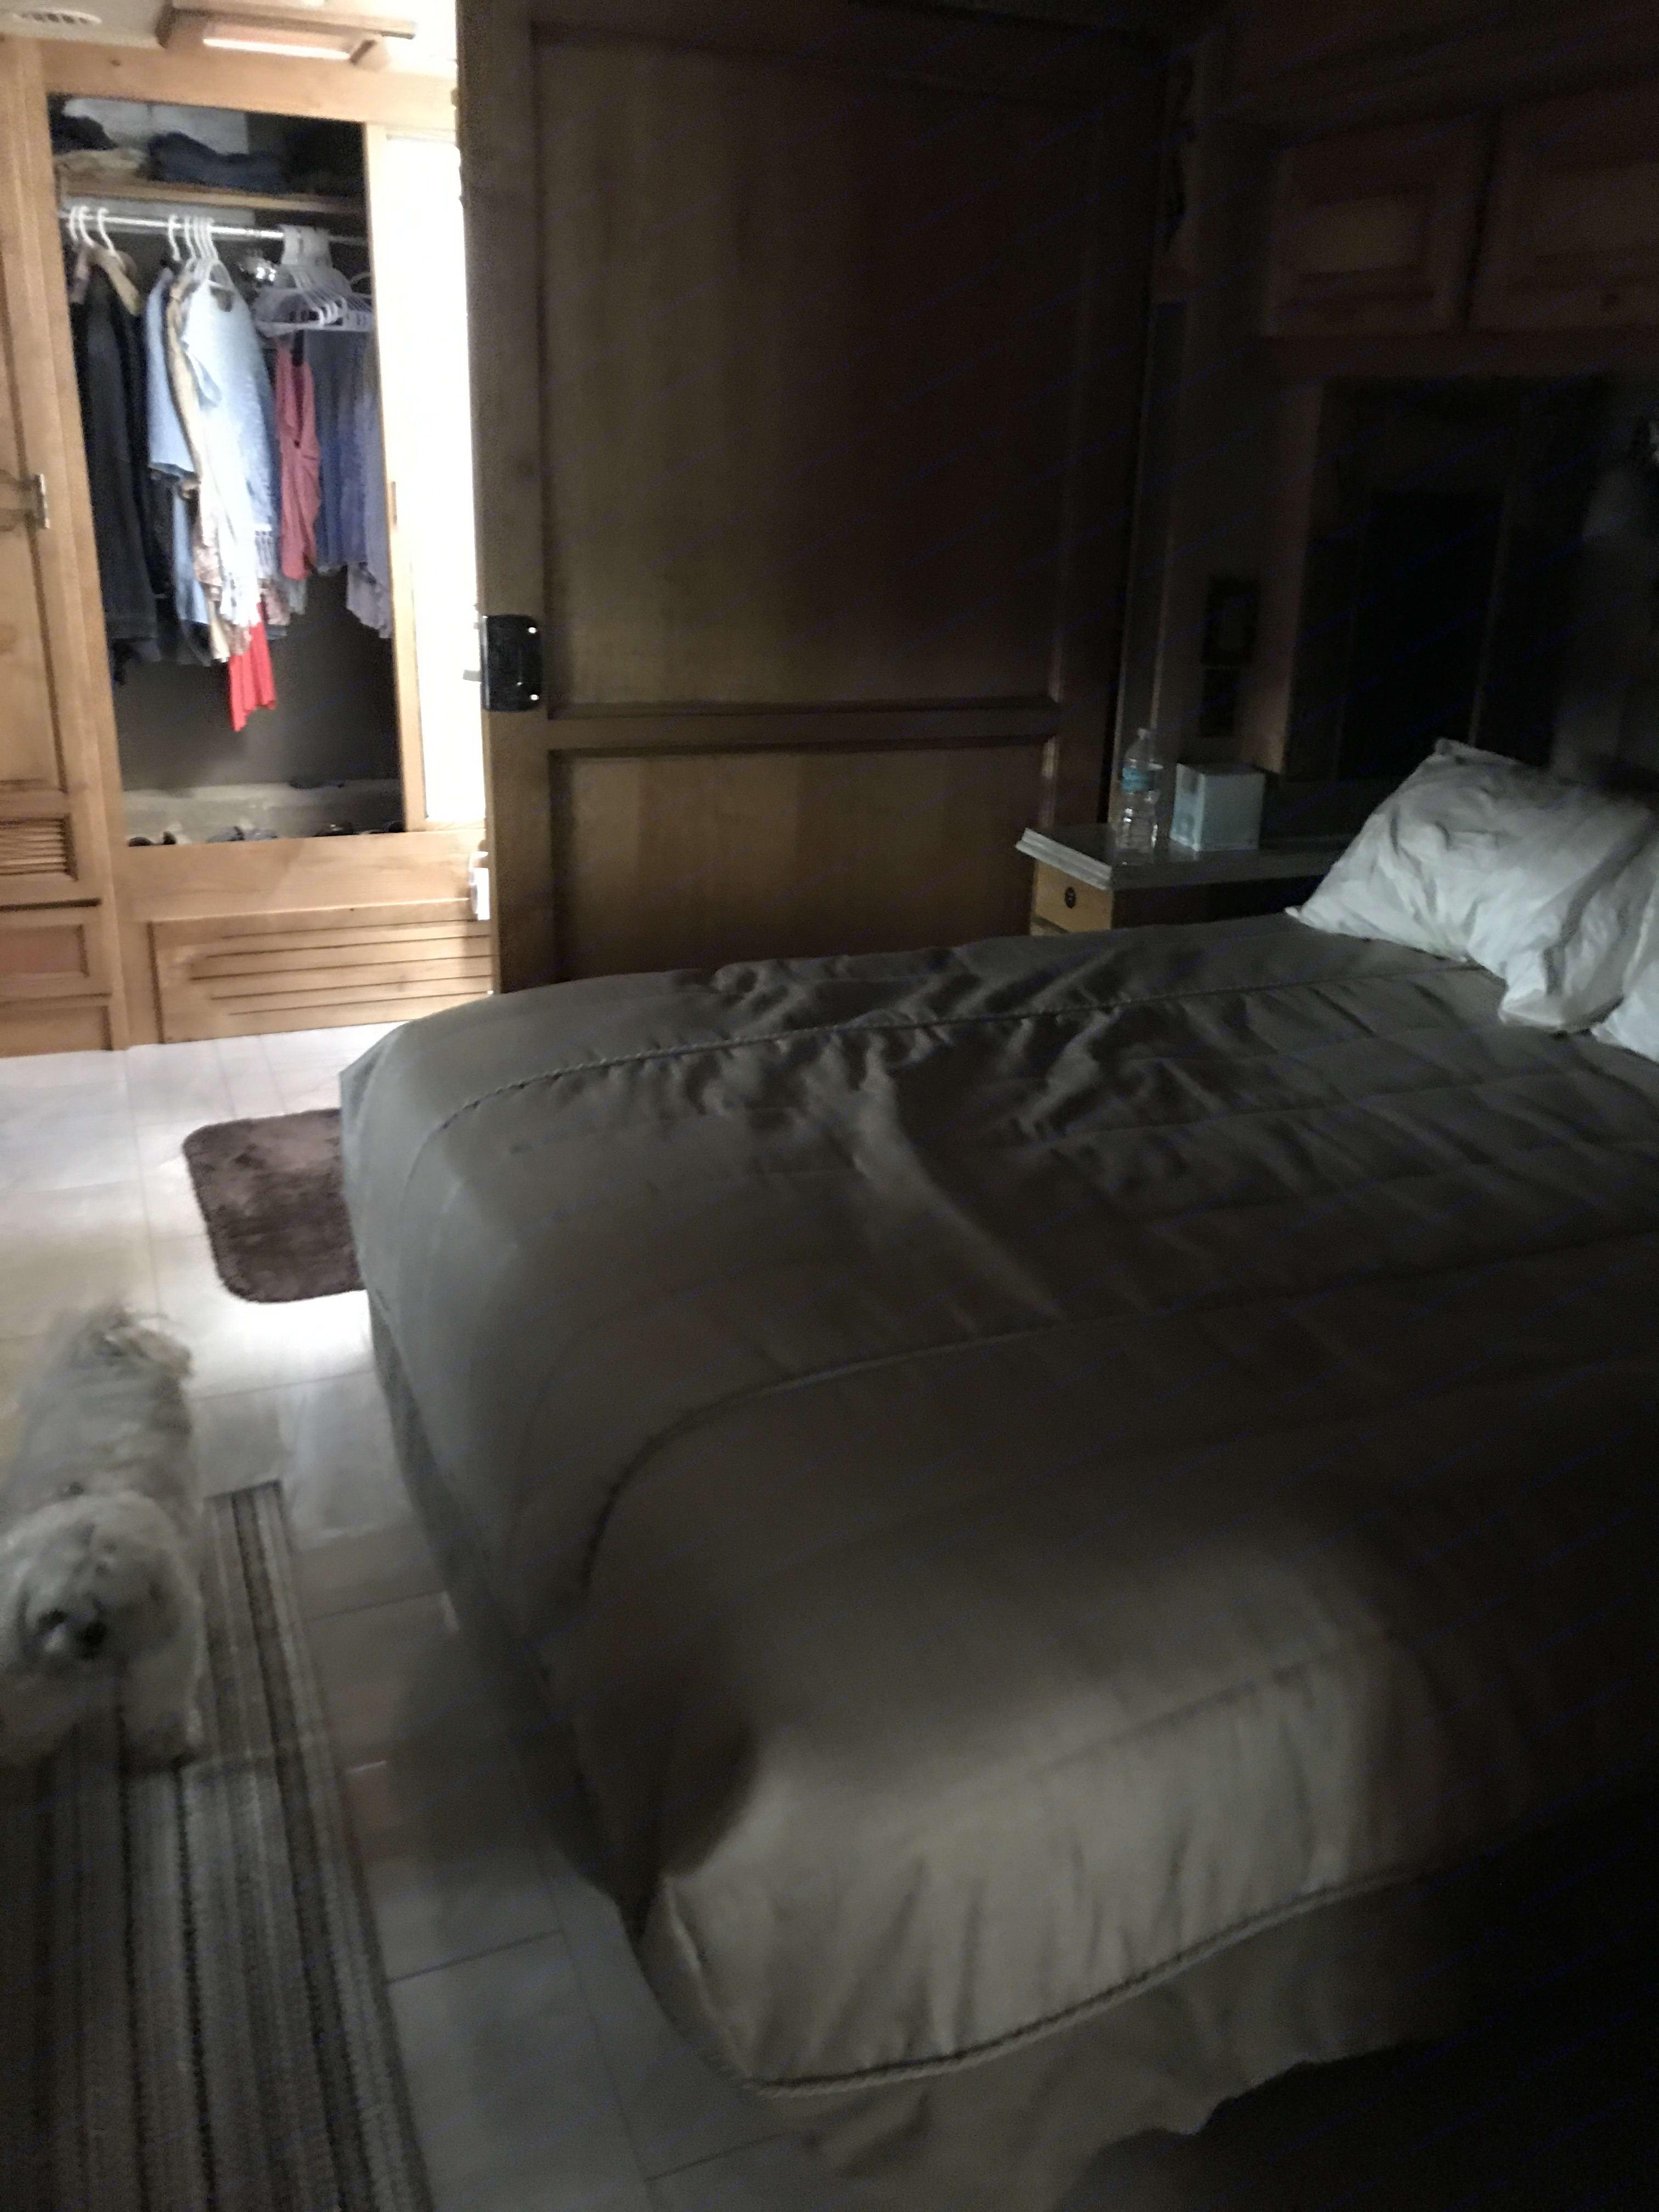 Queen size sleep number bed . Tiffin Motorhomes Phaeton 2018